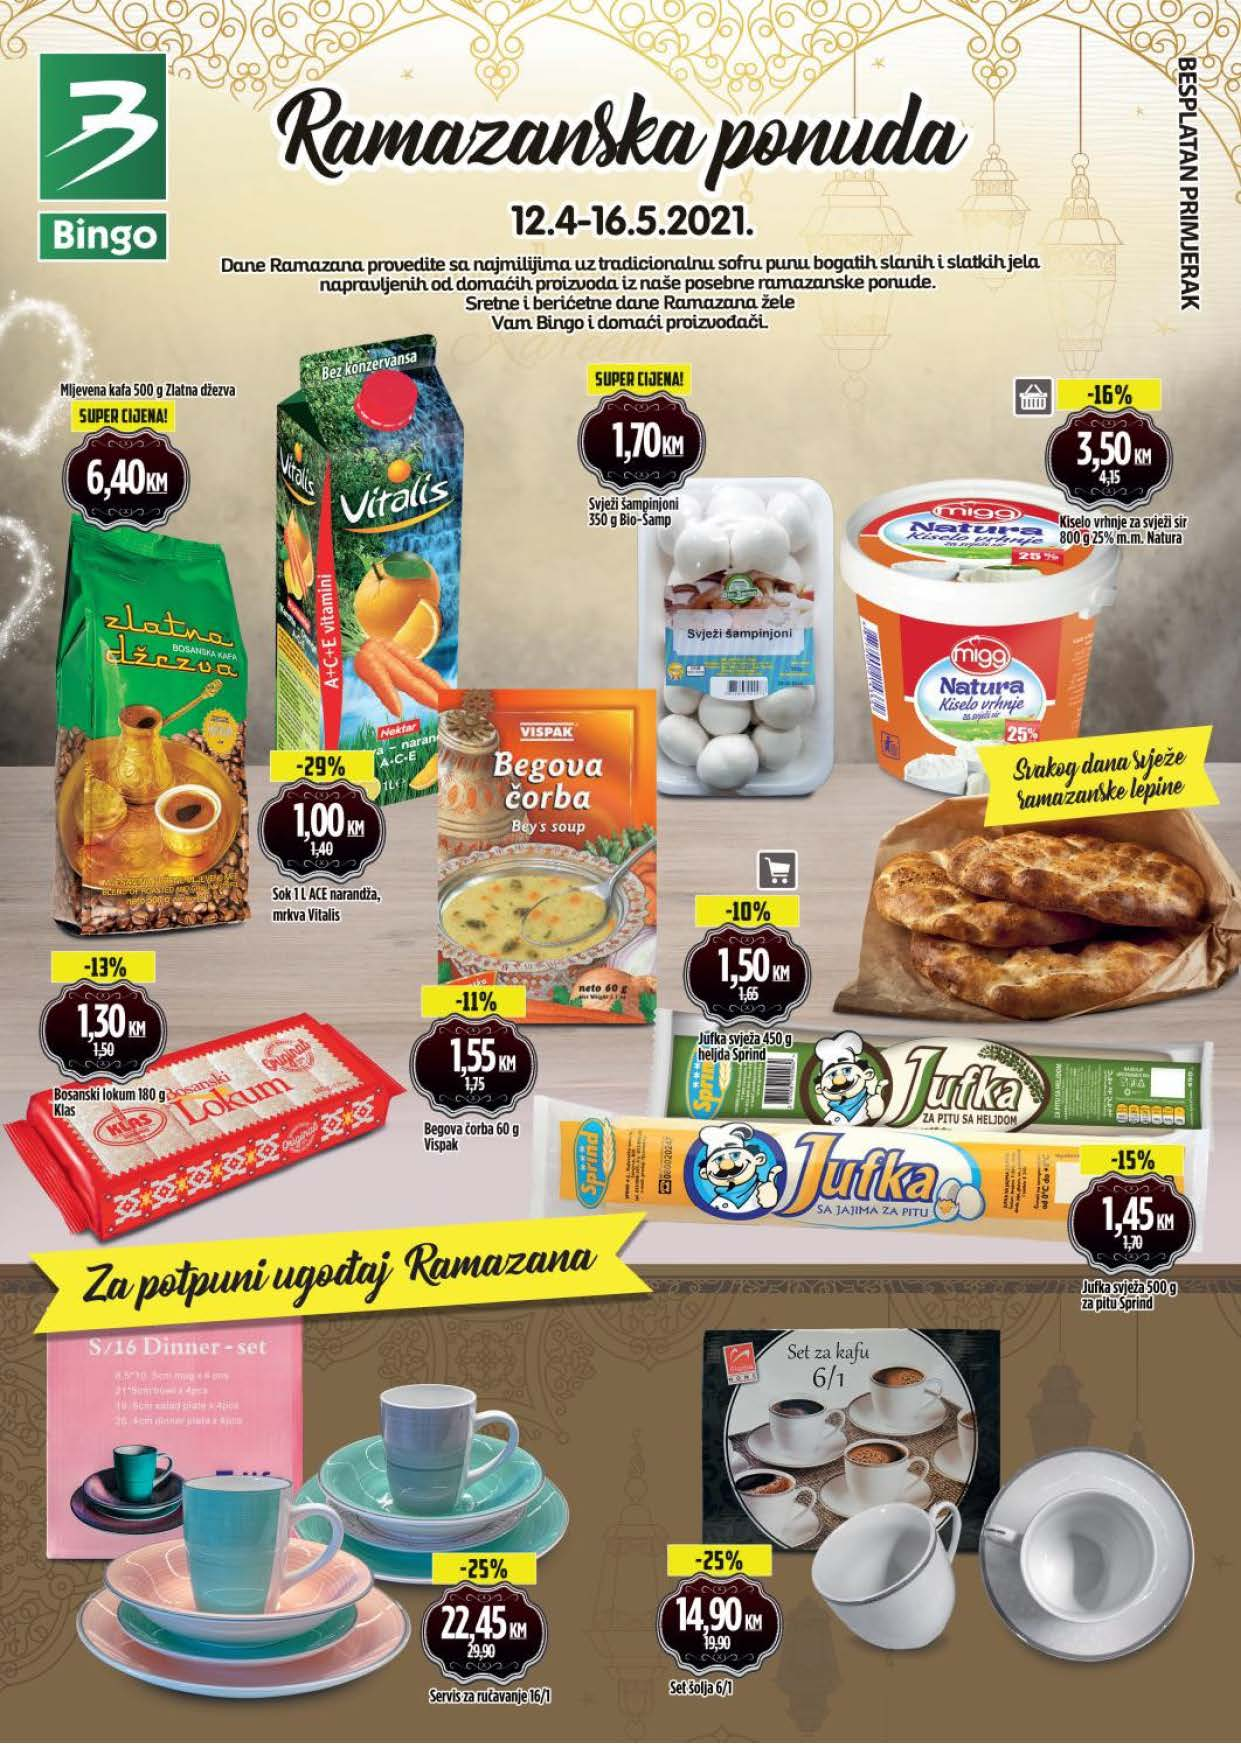 BINGO Katalog Ramazanska ponuda APRIL i MAJ 2021 12.04.2021. 16.05.2021. Page 1